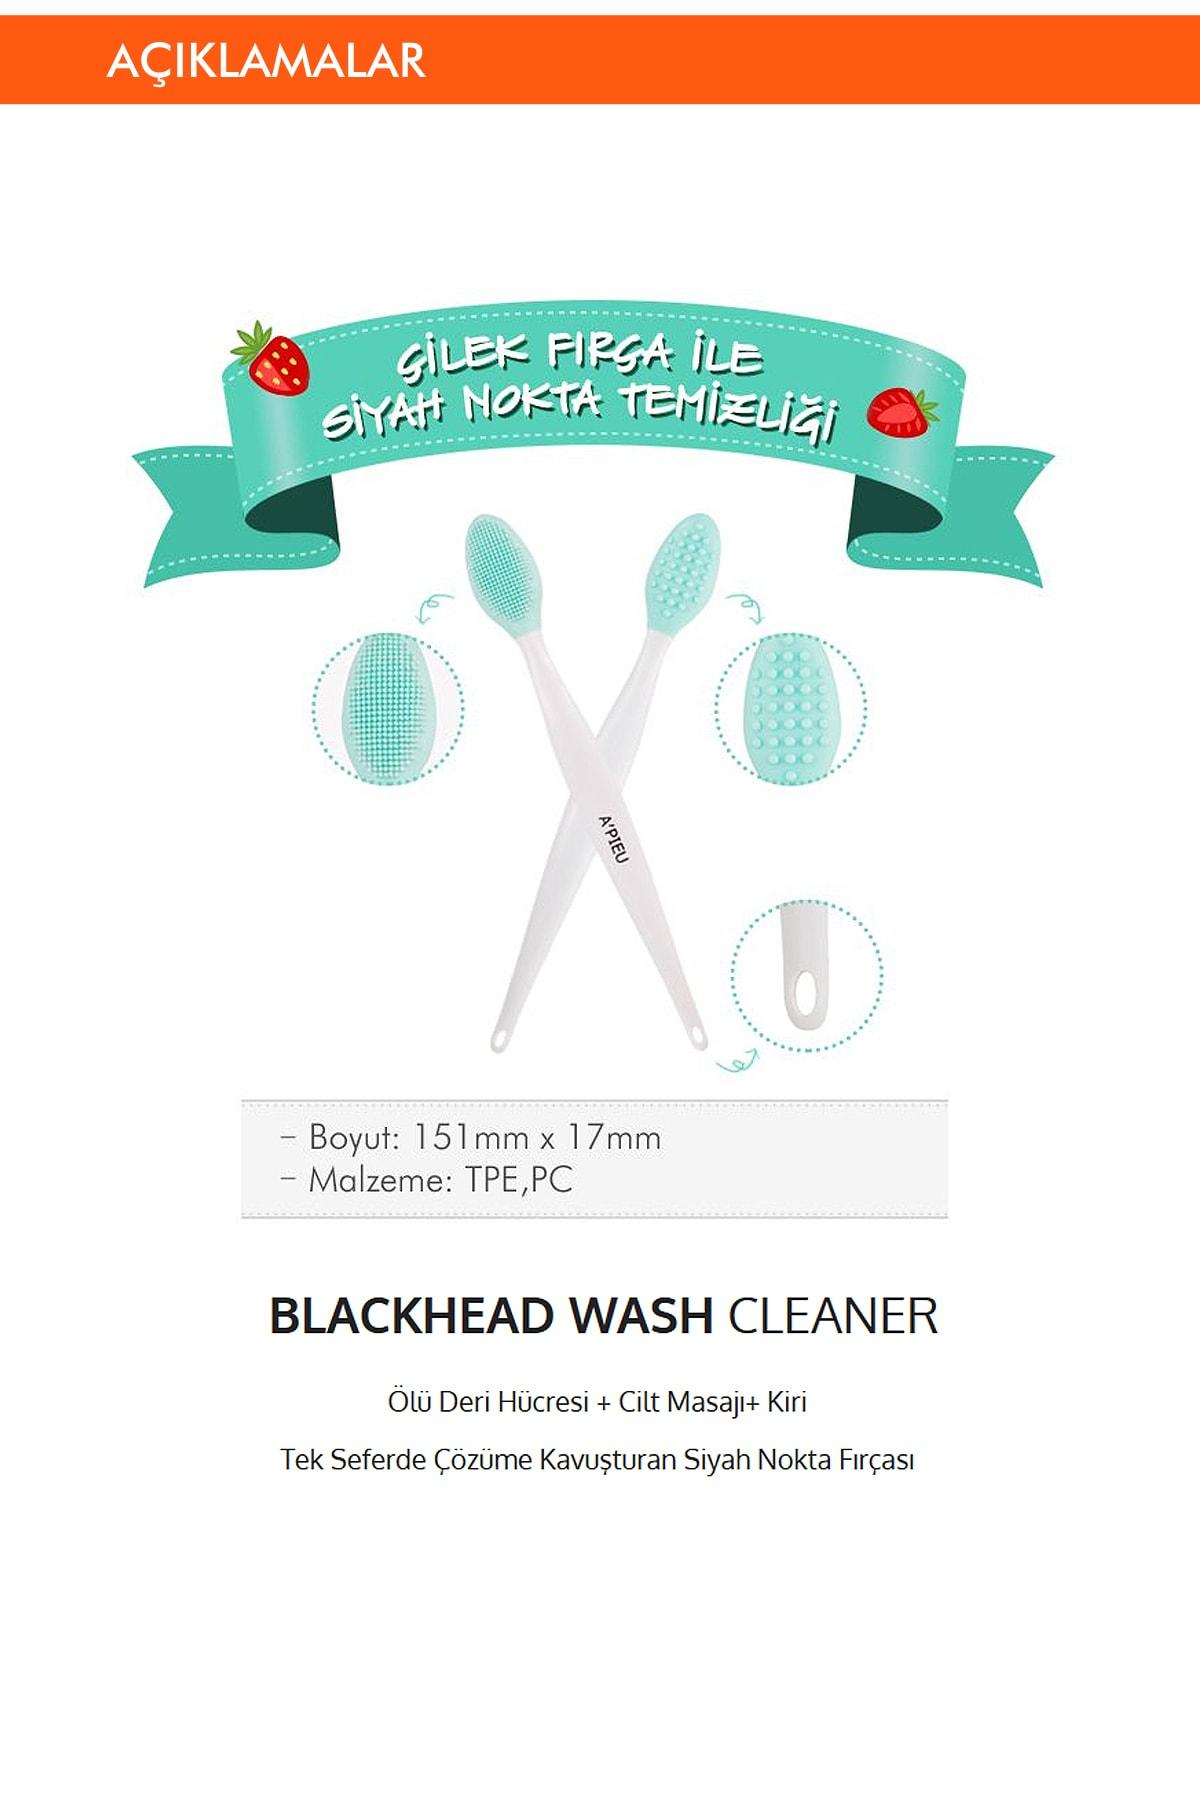 Missha Siyah Nokta Temizleme Fırçası APIEU Blackhead Wash Cleaner 1